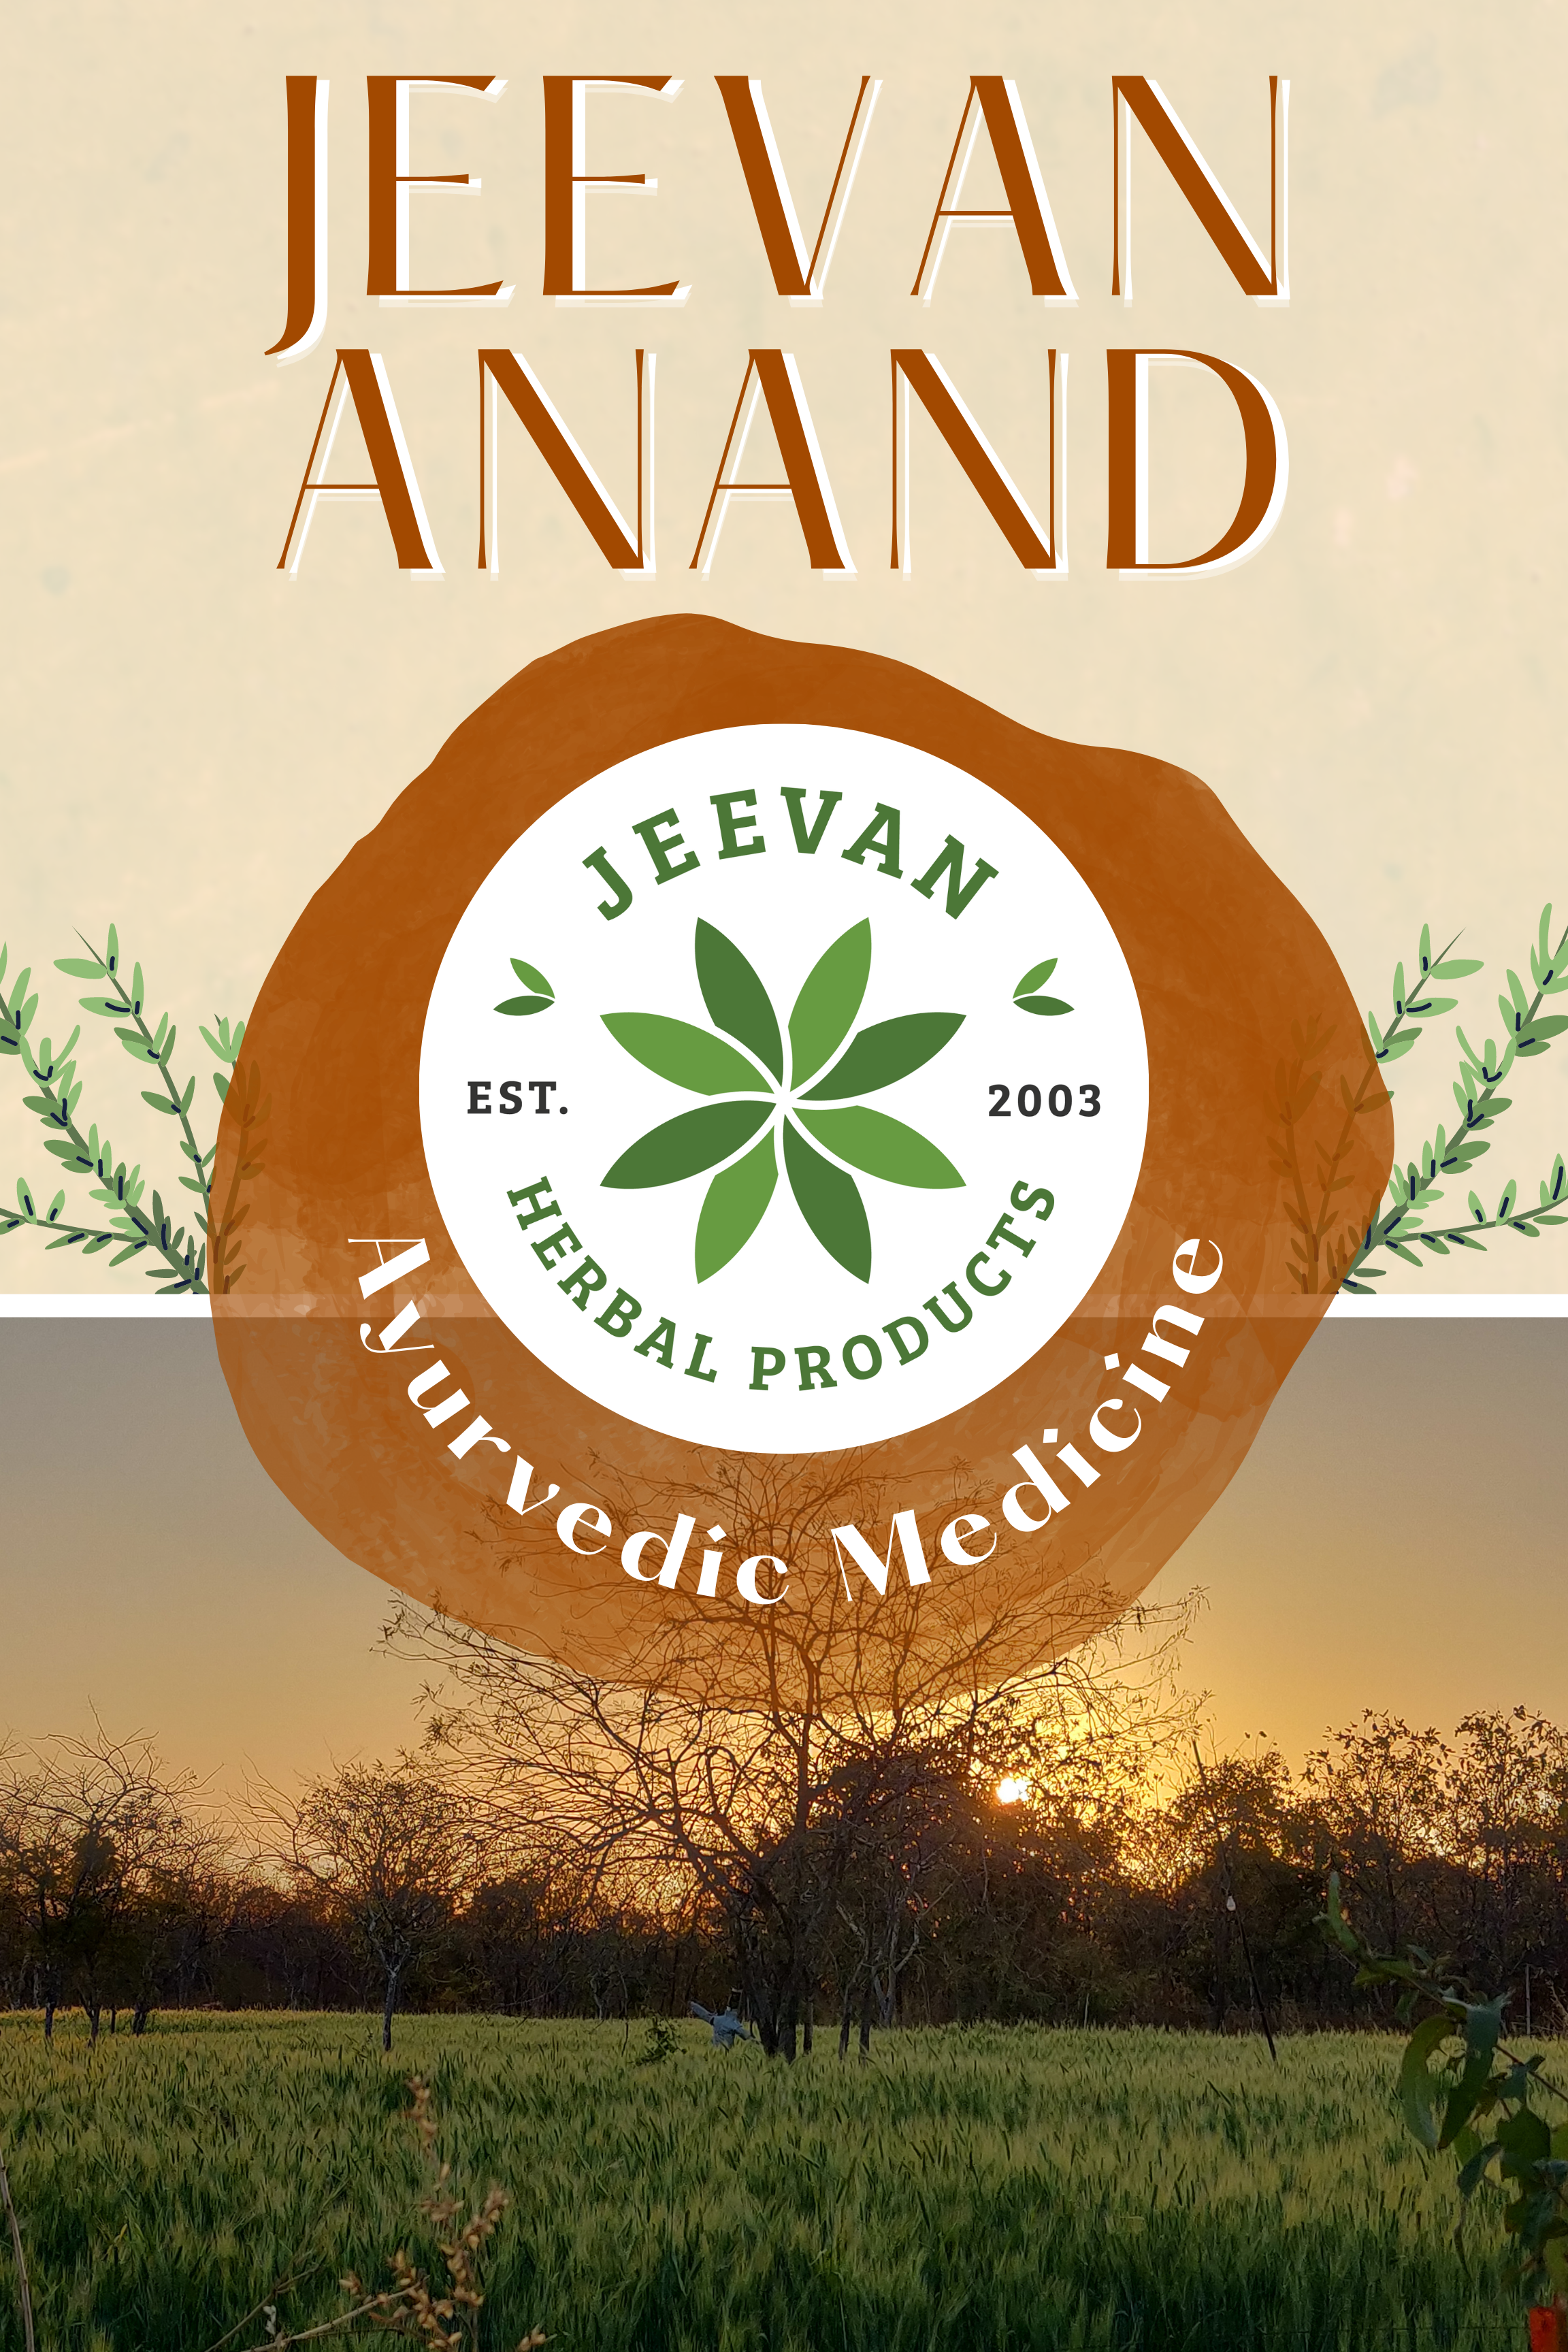 ayurveda, ayurvedic medicine, ayurvedic doctor, ayurvedic remedies, jeevan anand , jeevan herbal products